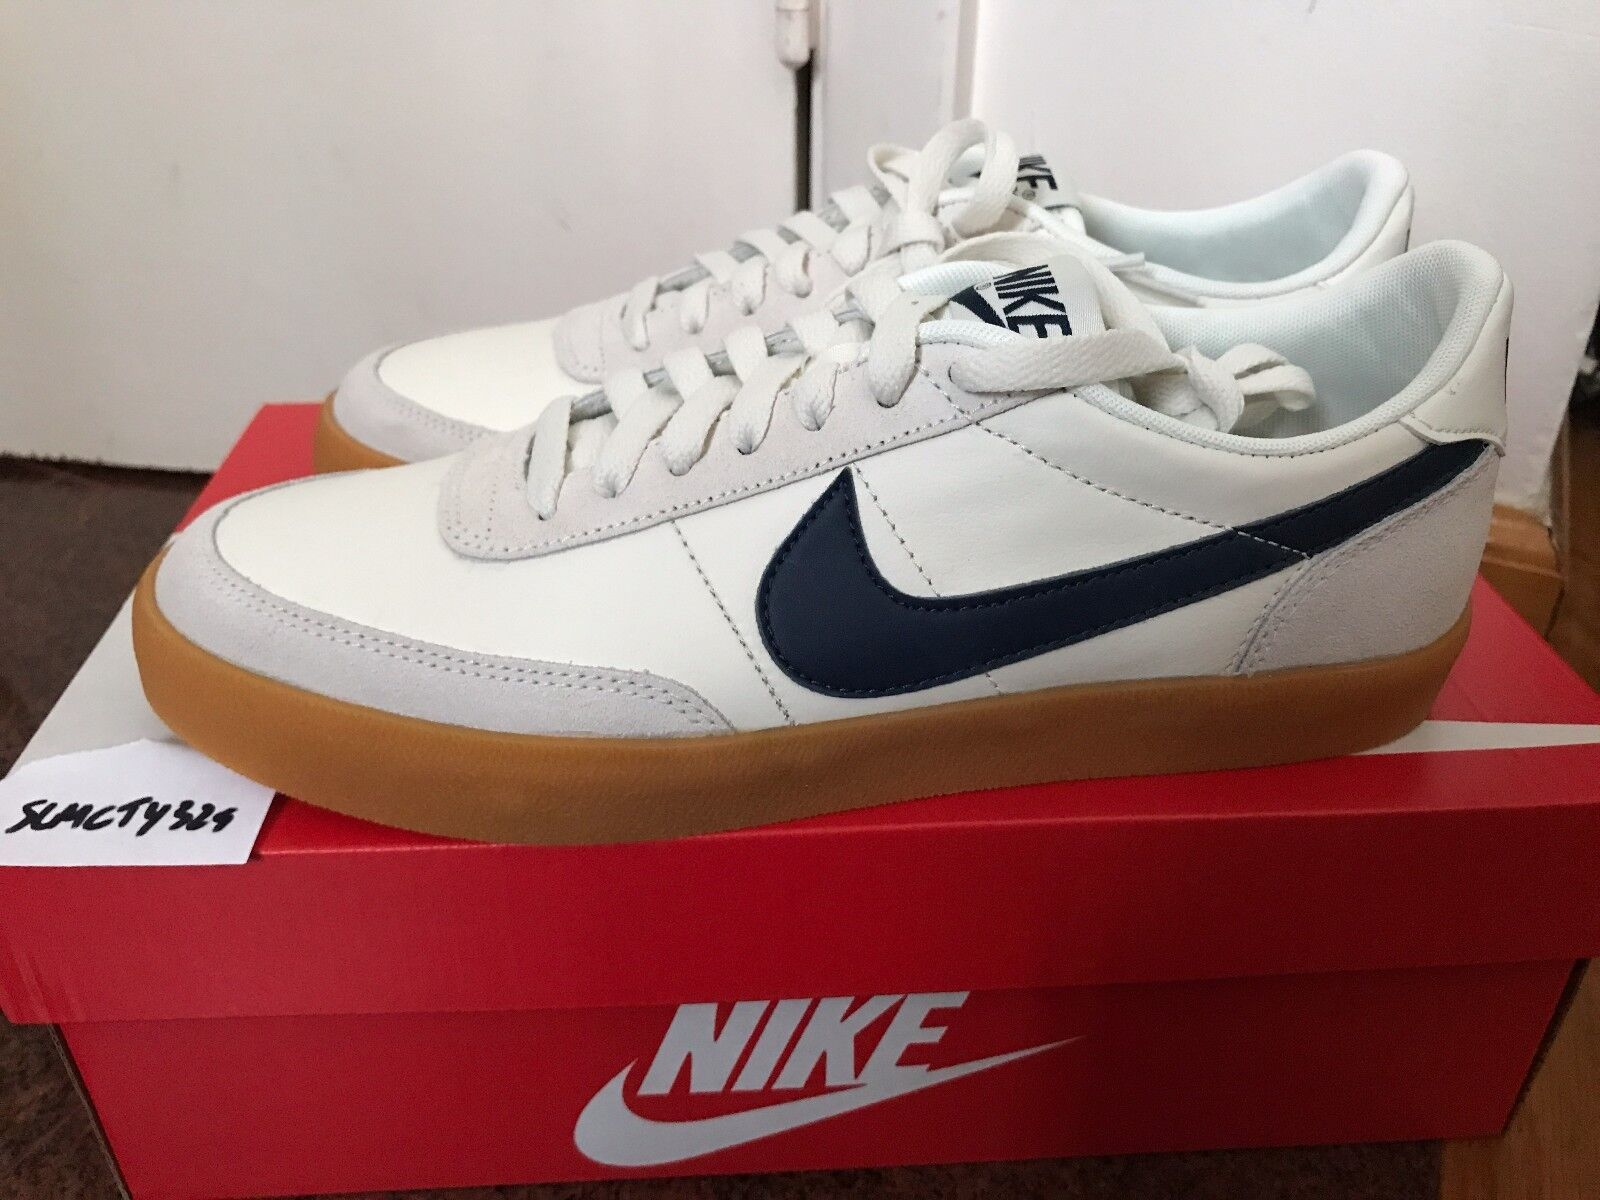 J. Crew Nike Killshot 2 Leather Sail Midnight Navy Gum Jaune 432997-107 8-12